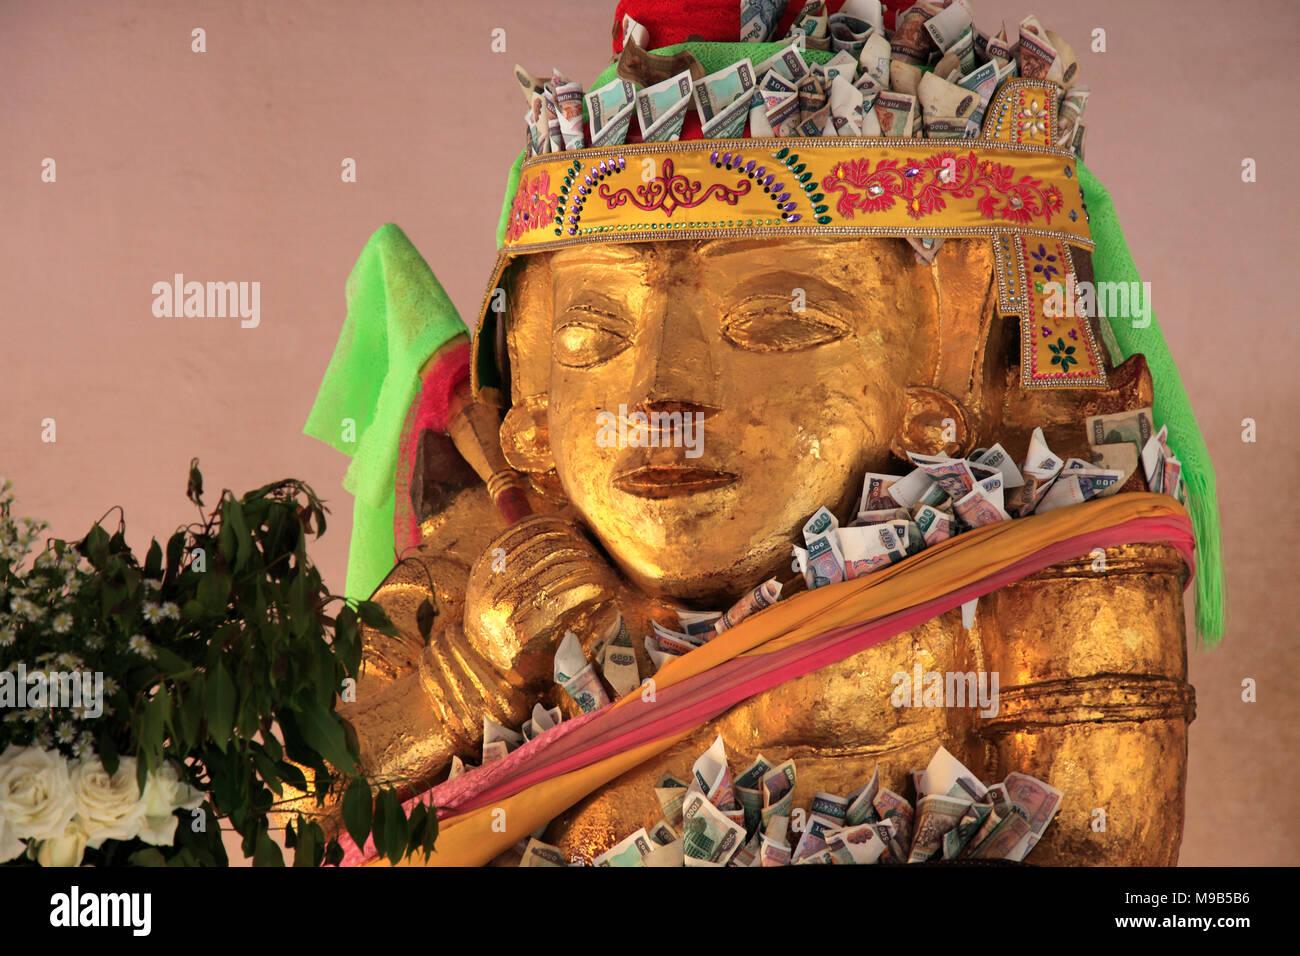 Myanmar, Bagan, Shwezigon Pagoda, Nat spirit, statue, Stock Photo